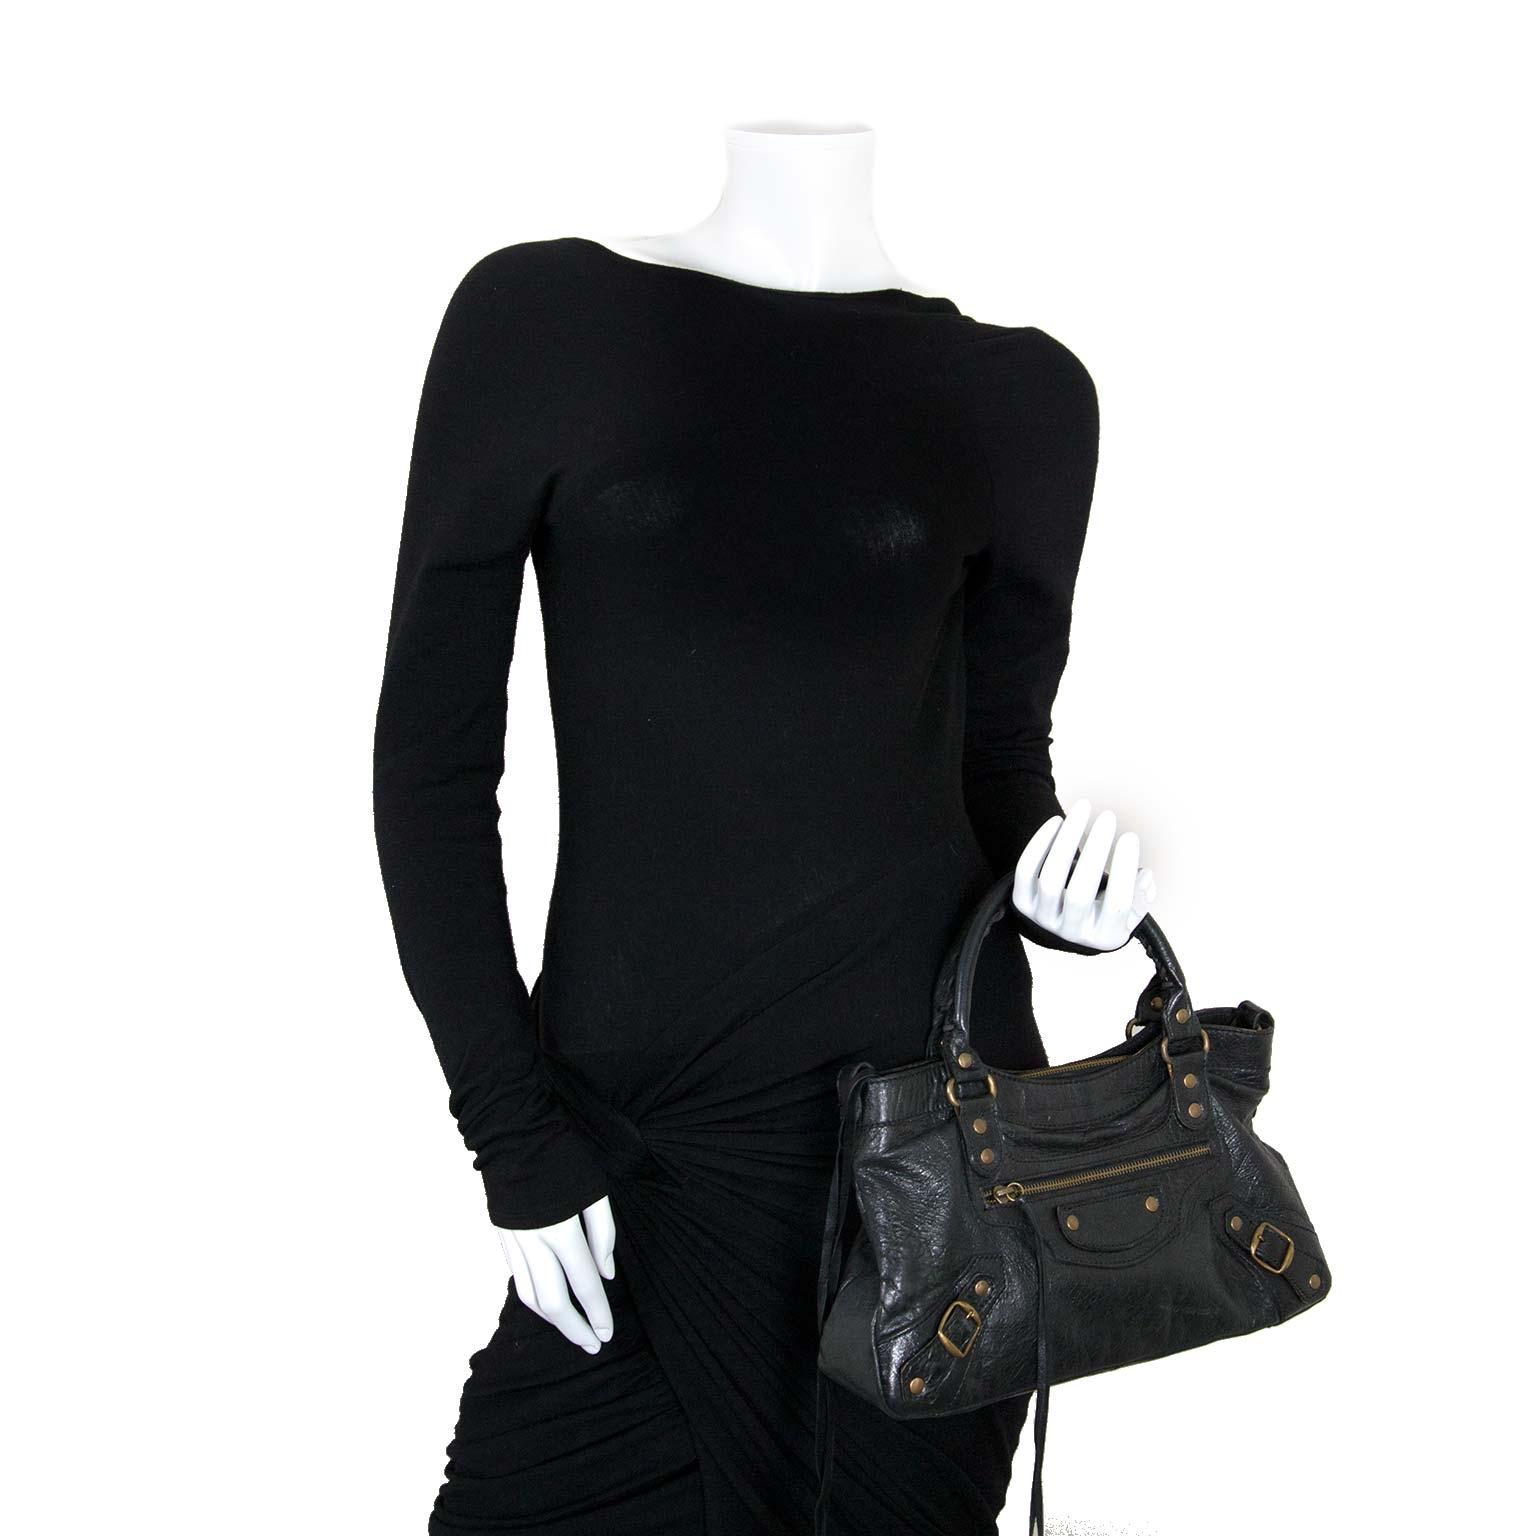 8421bec622878 ... balenciaga black classic first bag now for sale at labellov vintage  fashion webshop belgium